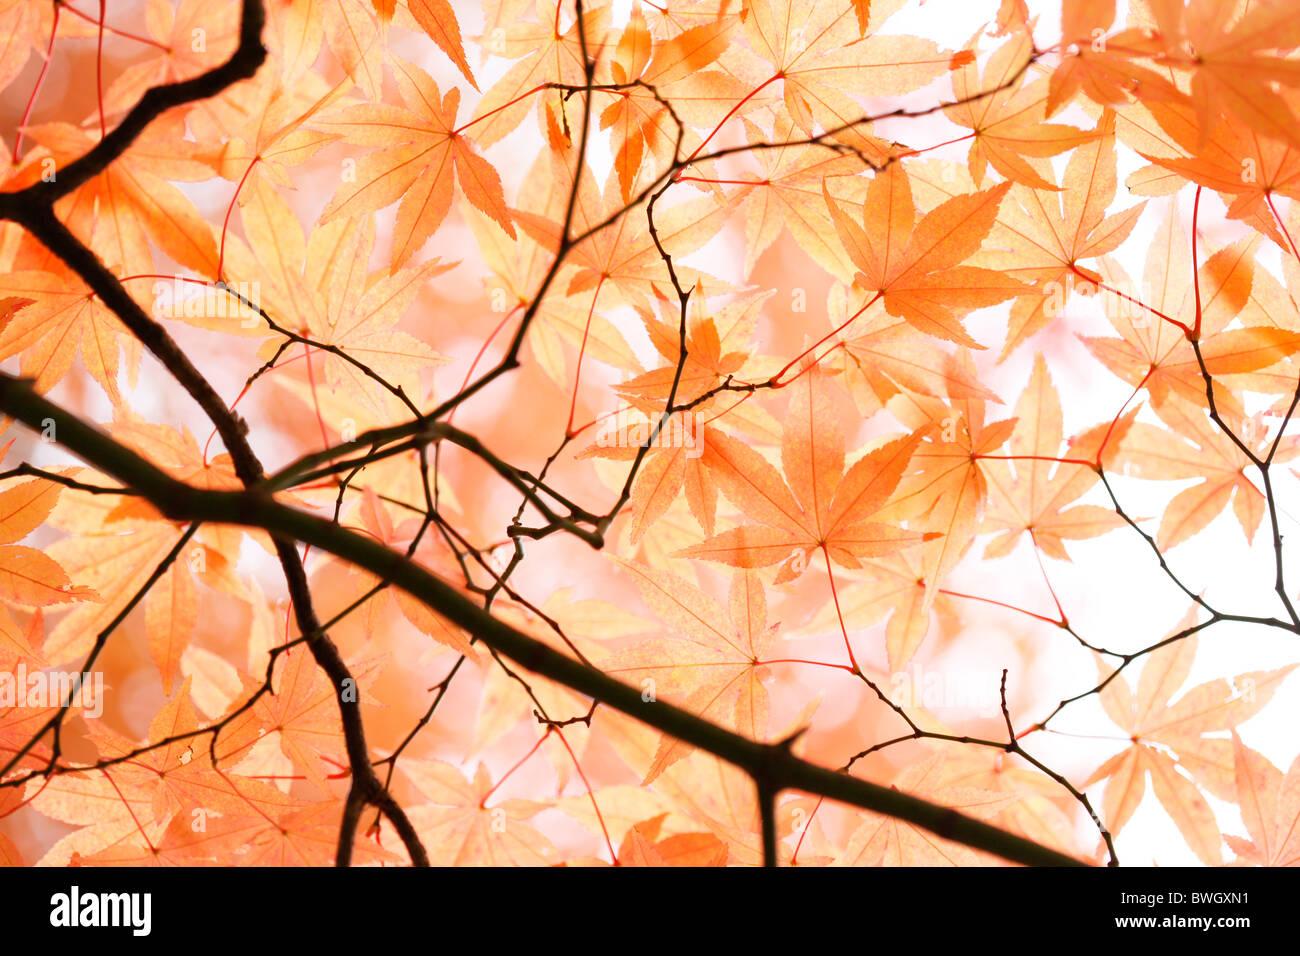 schönen Ahorn Baldachin im Herbst kurz vor dem Mauerfall - Fine Art-Fotografie, Jane Ann Butler Fotografie Stockbild